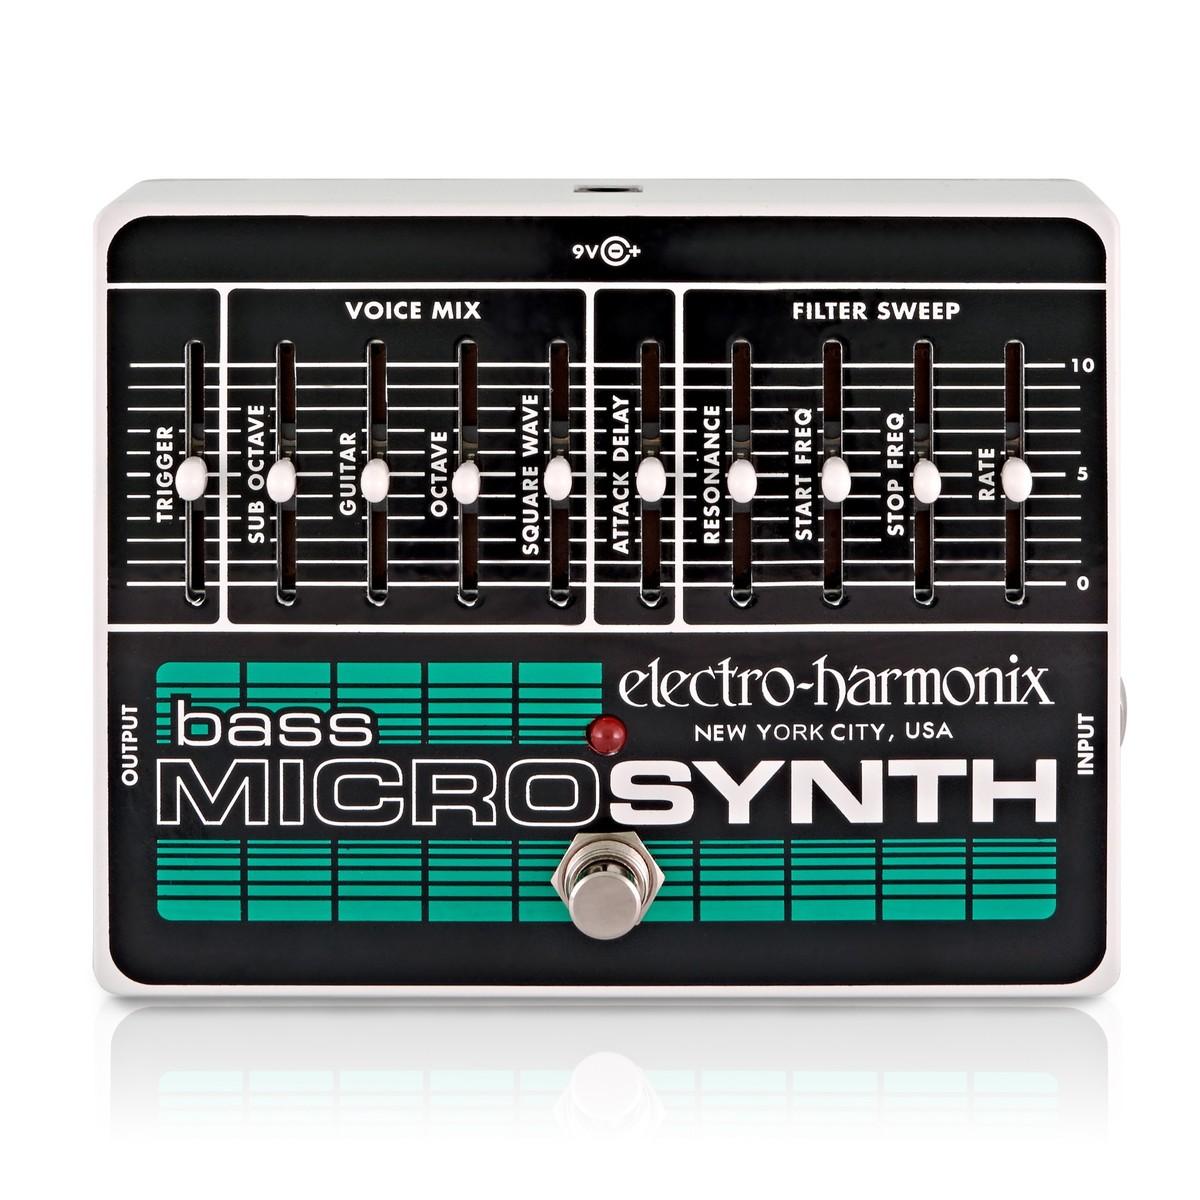 Electro Harmonix Bass Micro Synthesizer Analog Microsynth